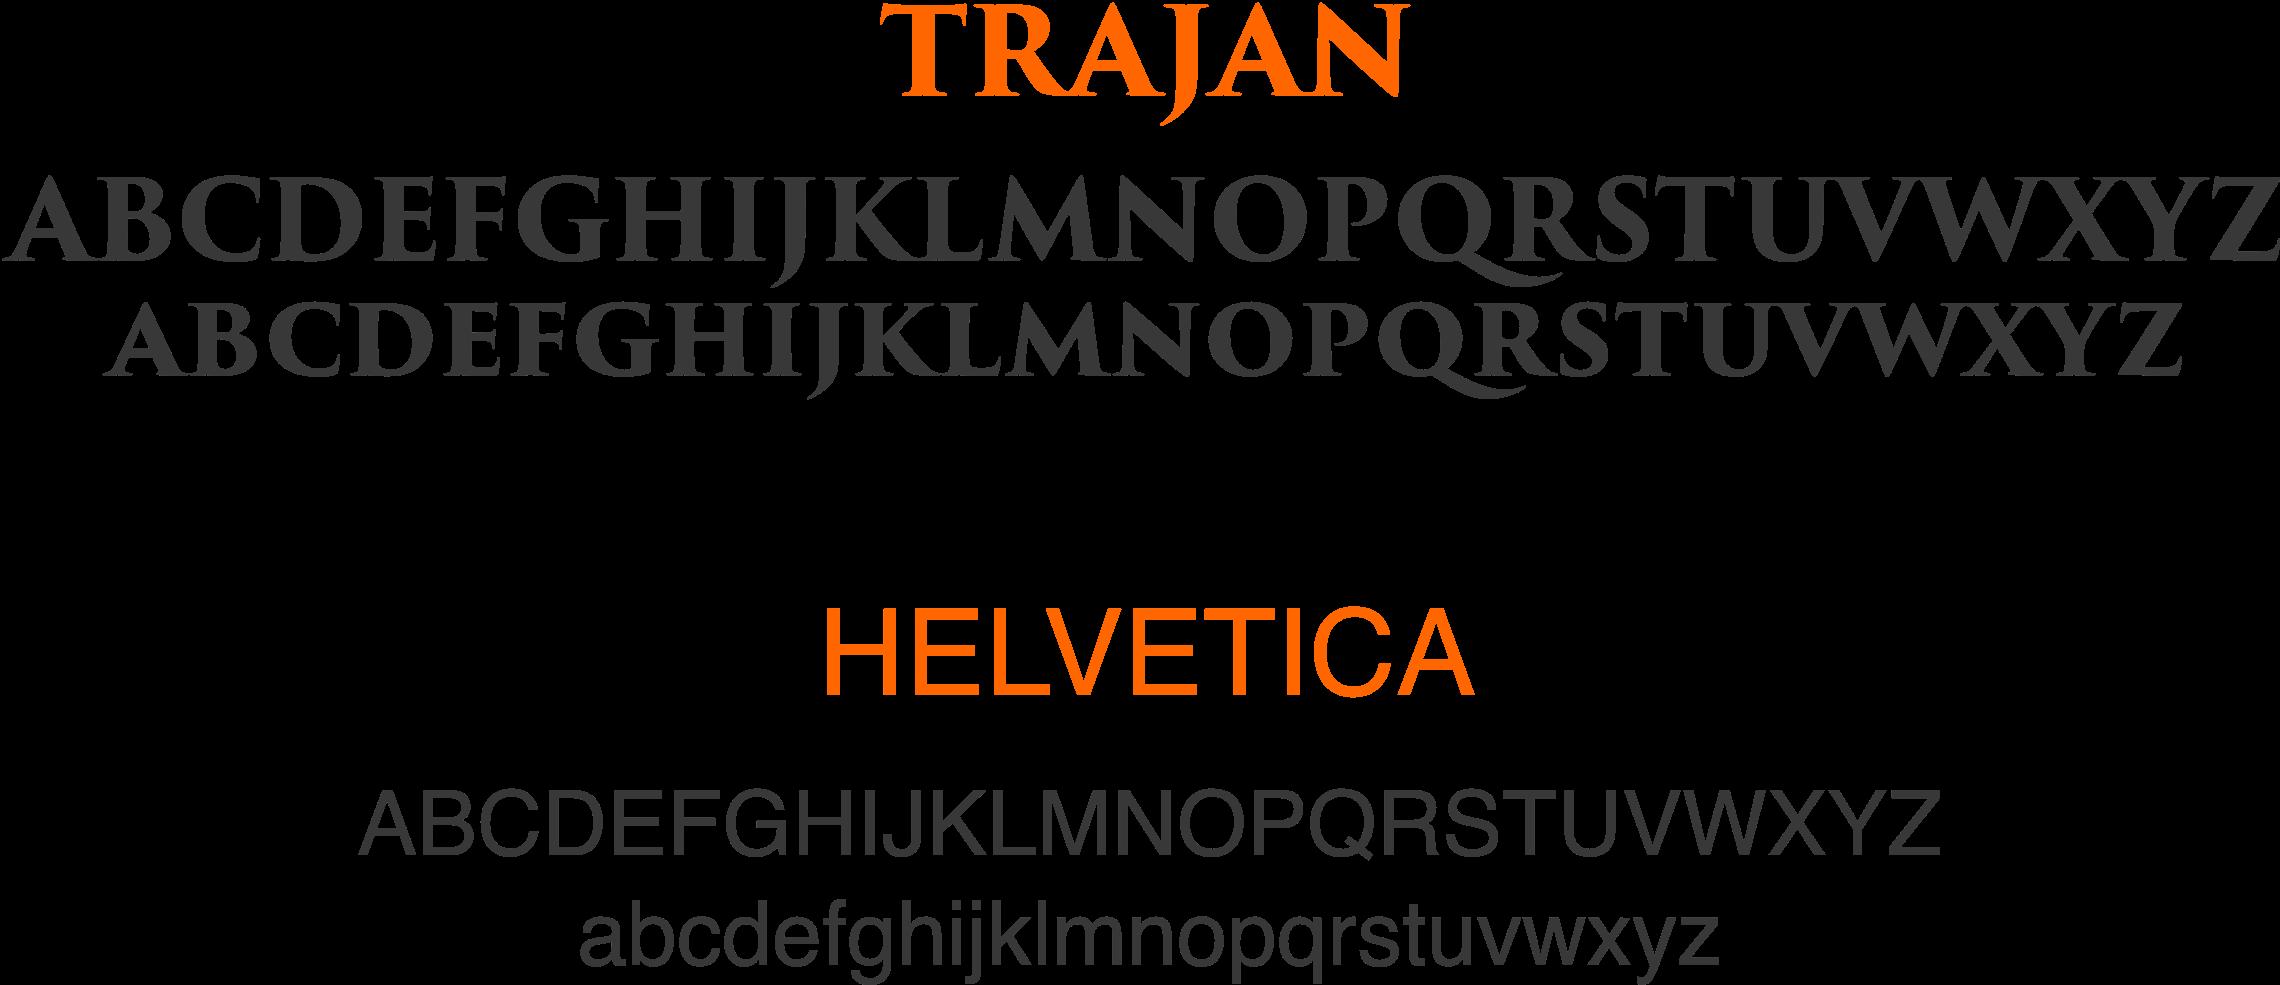 Triple-Net-Properties-NNN-Real-Estate-Invetment-Trusts-REITS-1031-Exchange-Website-Design-Font-Palette